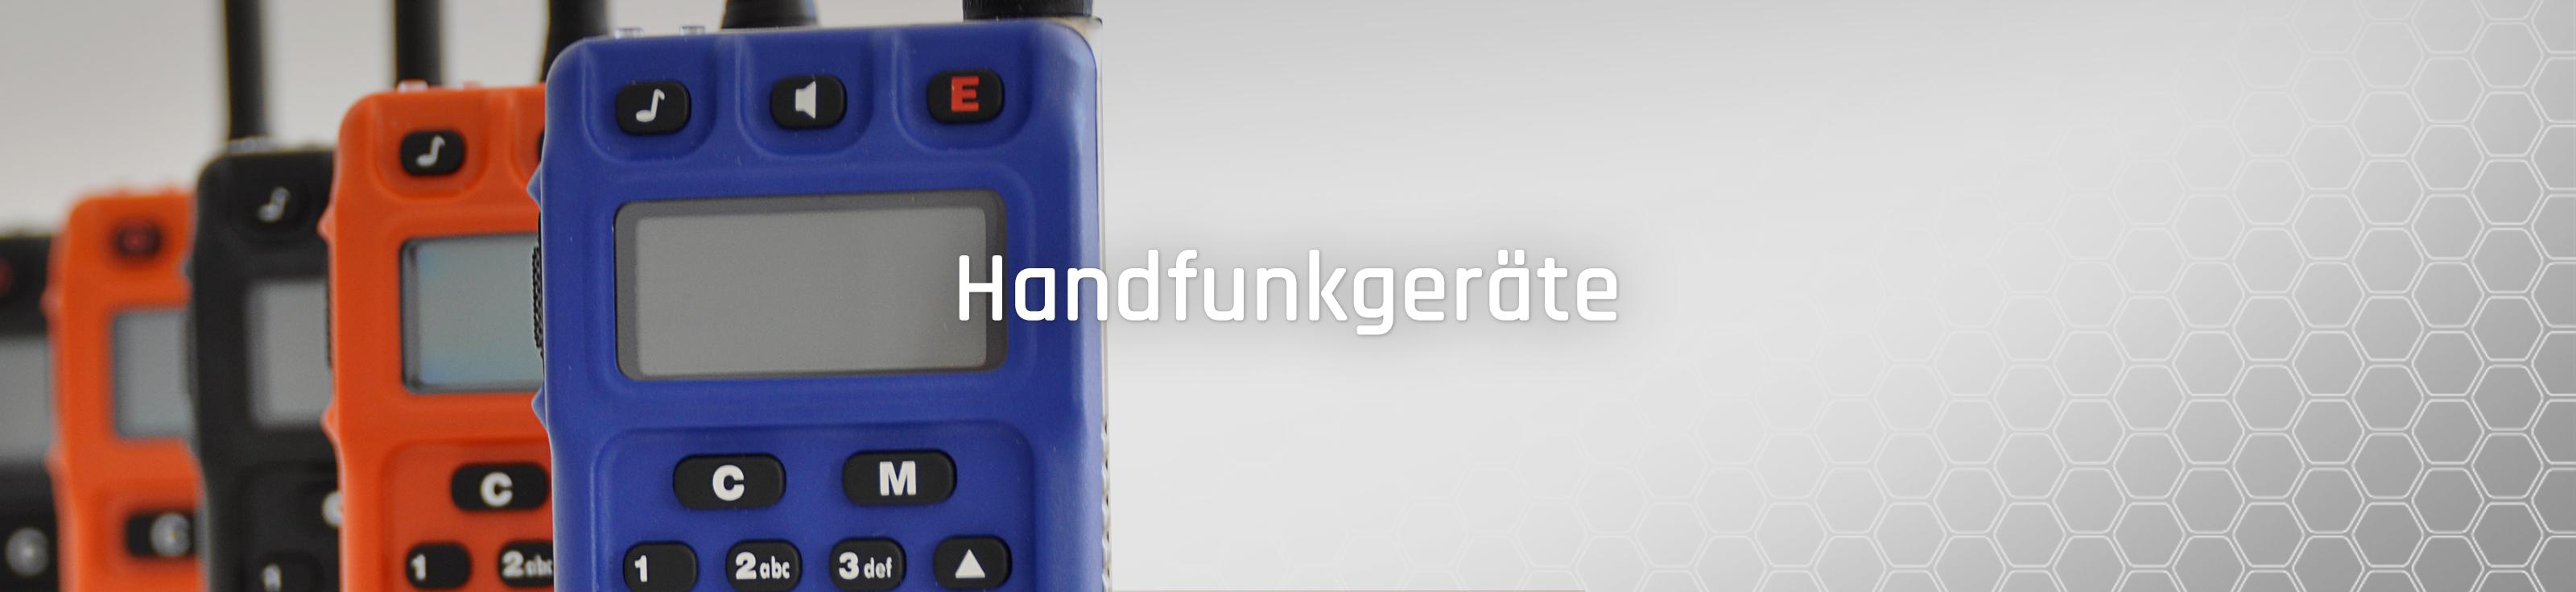 slider_handfunkgeräte_prod